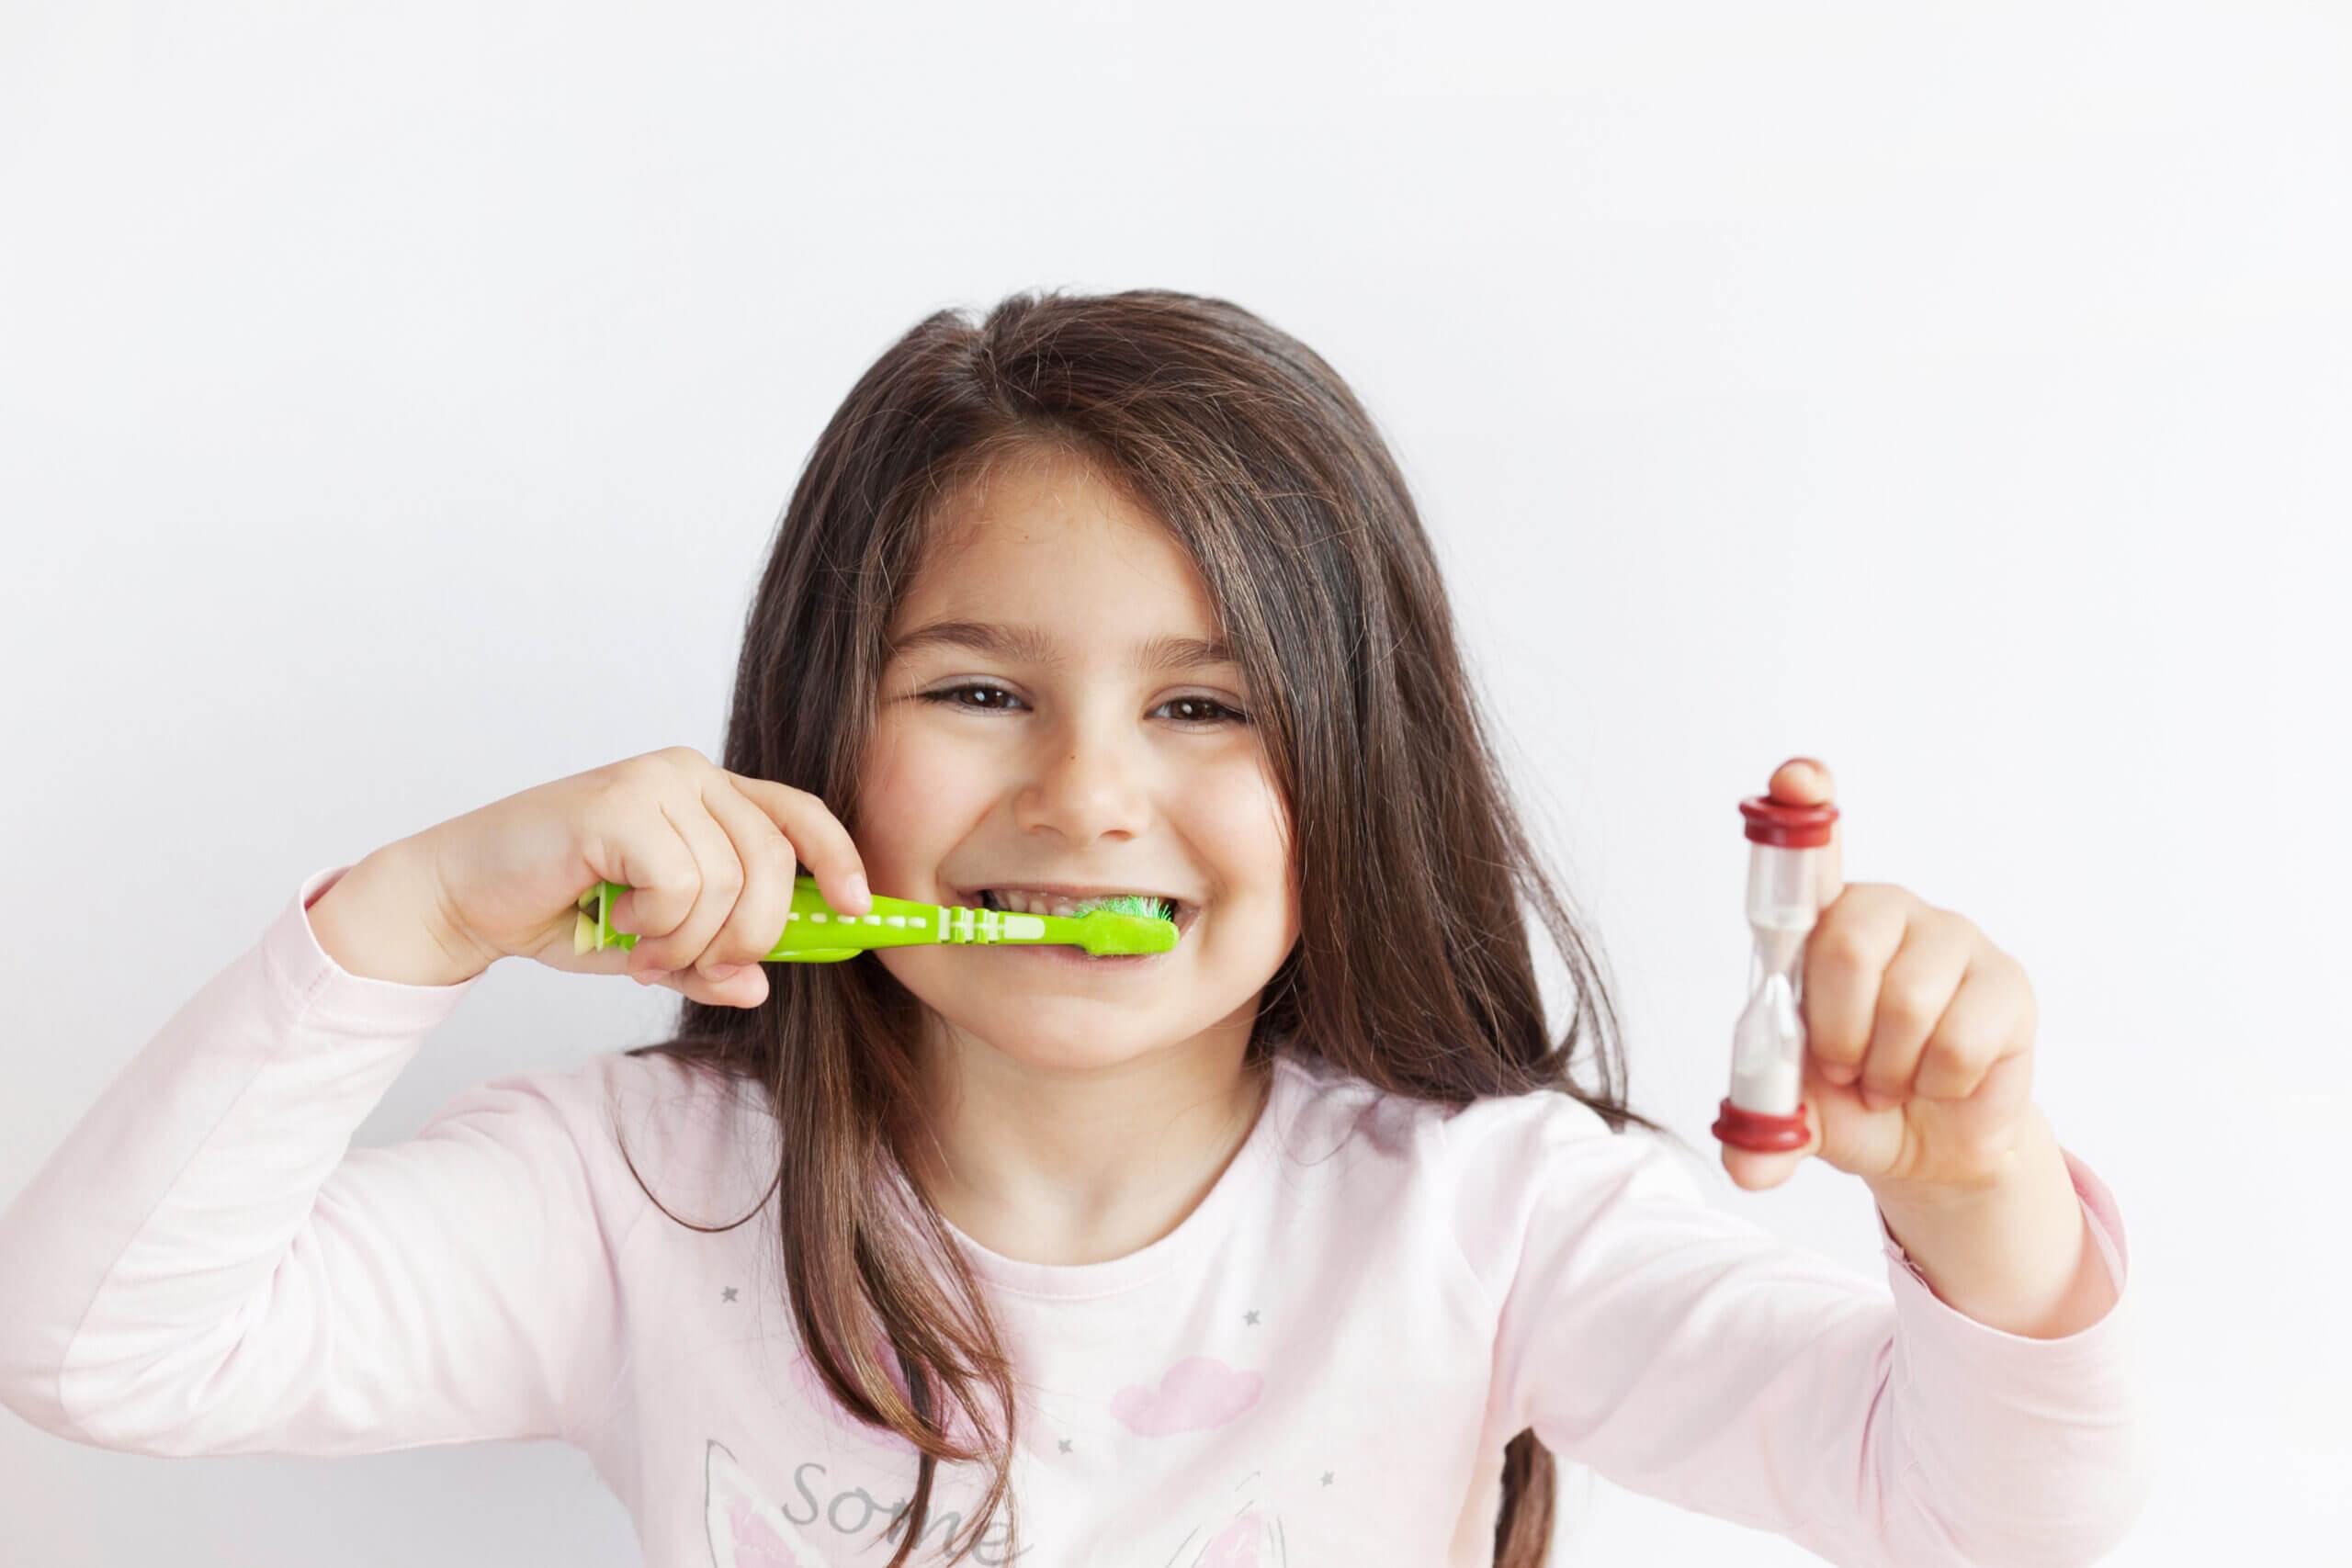 brushing teeth create fun for kids super dentist pediatric care